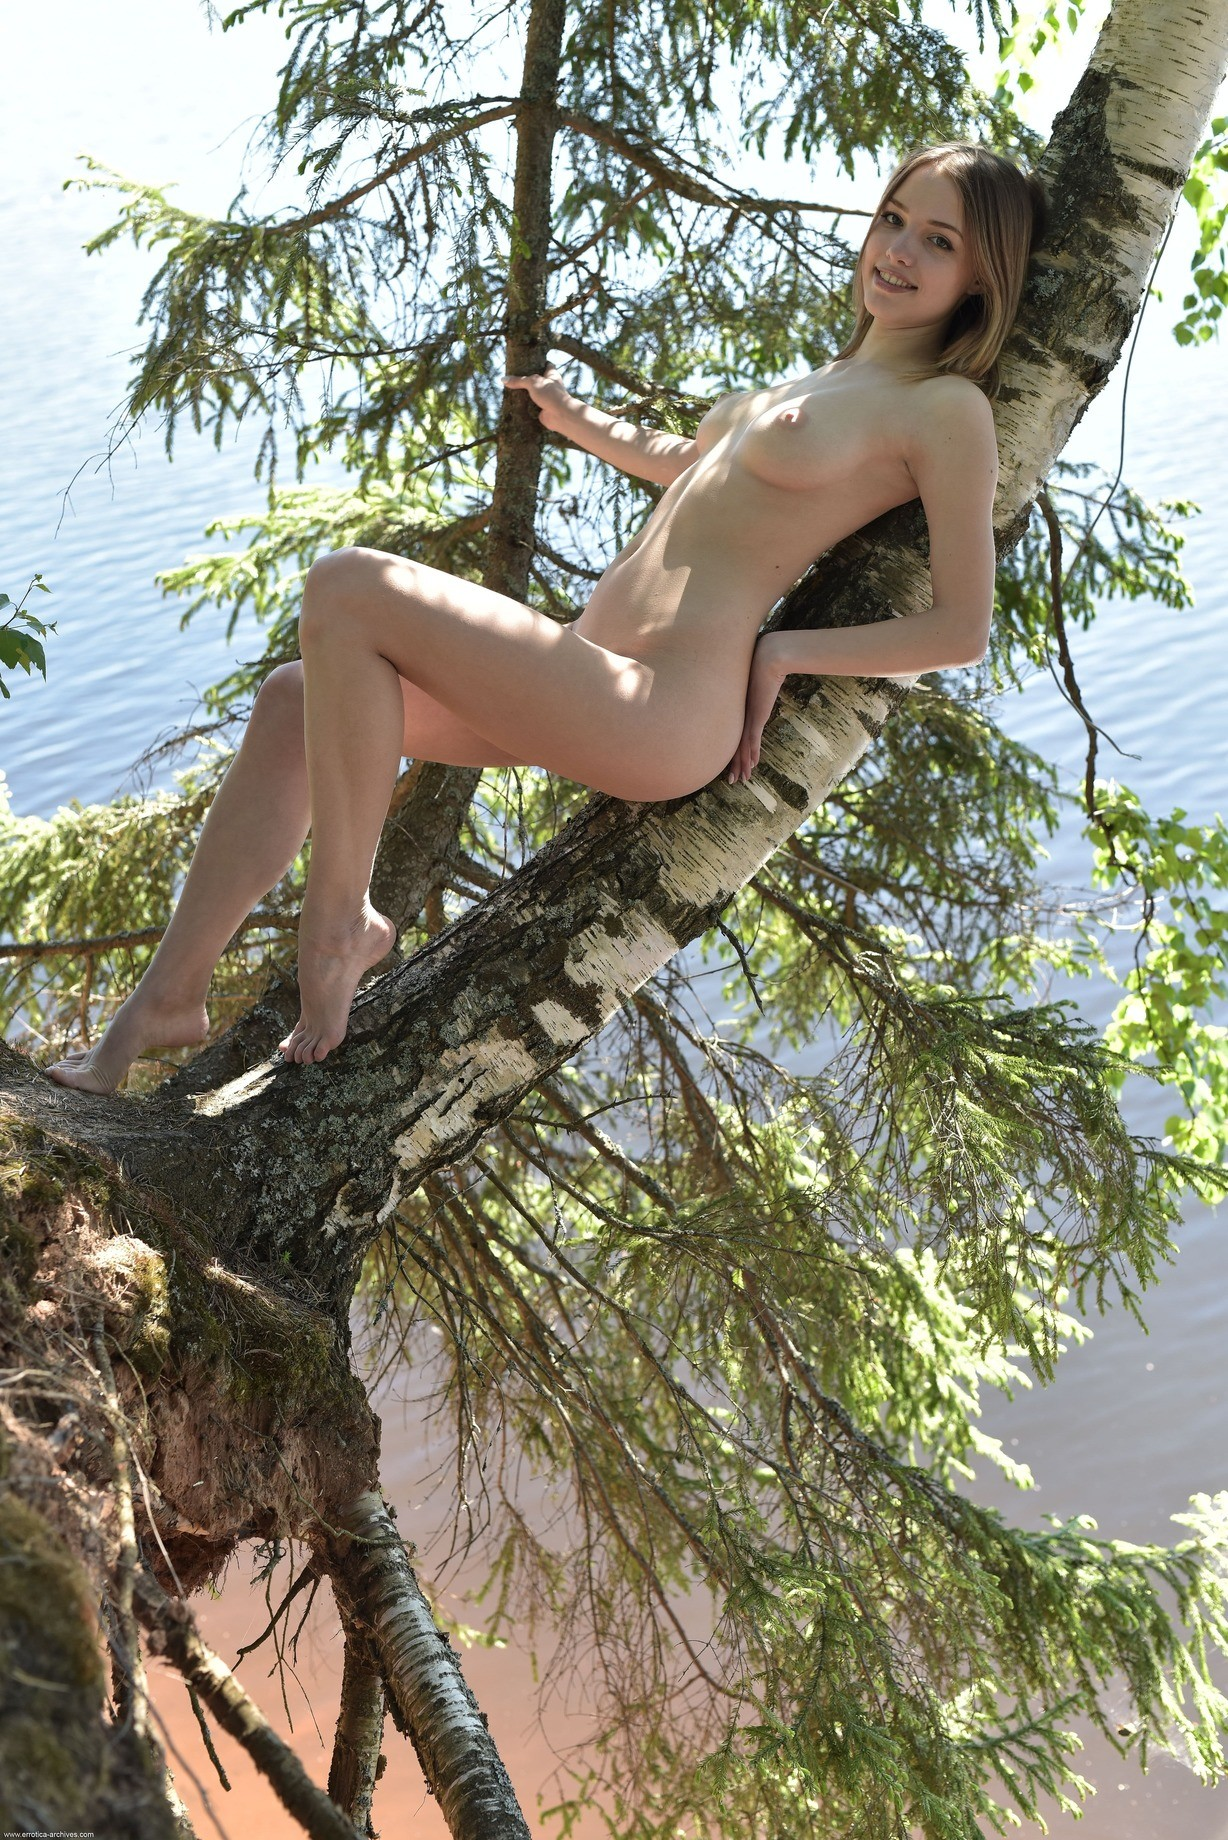 Голая девушка на природе у реки - фото